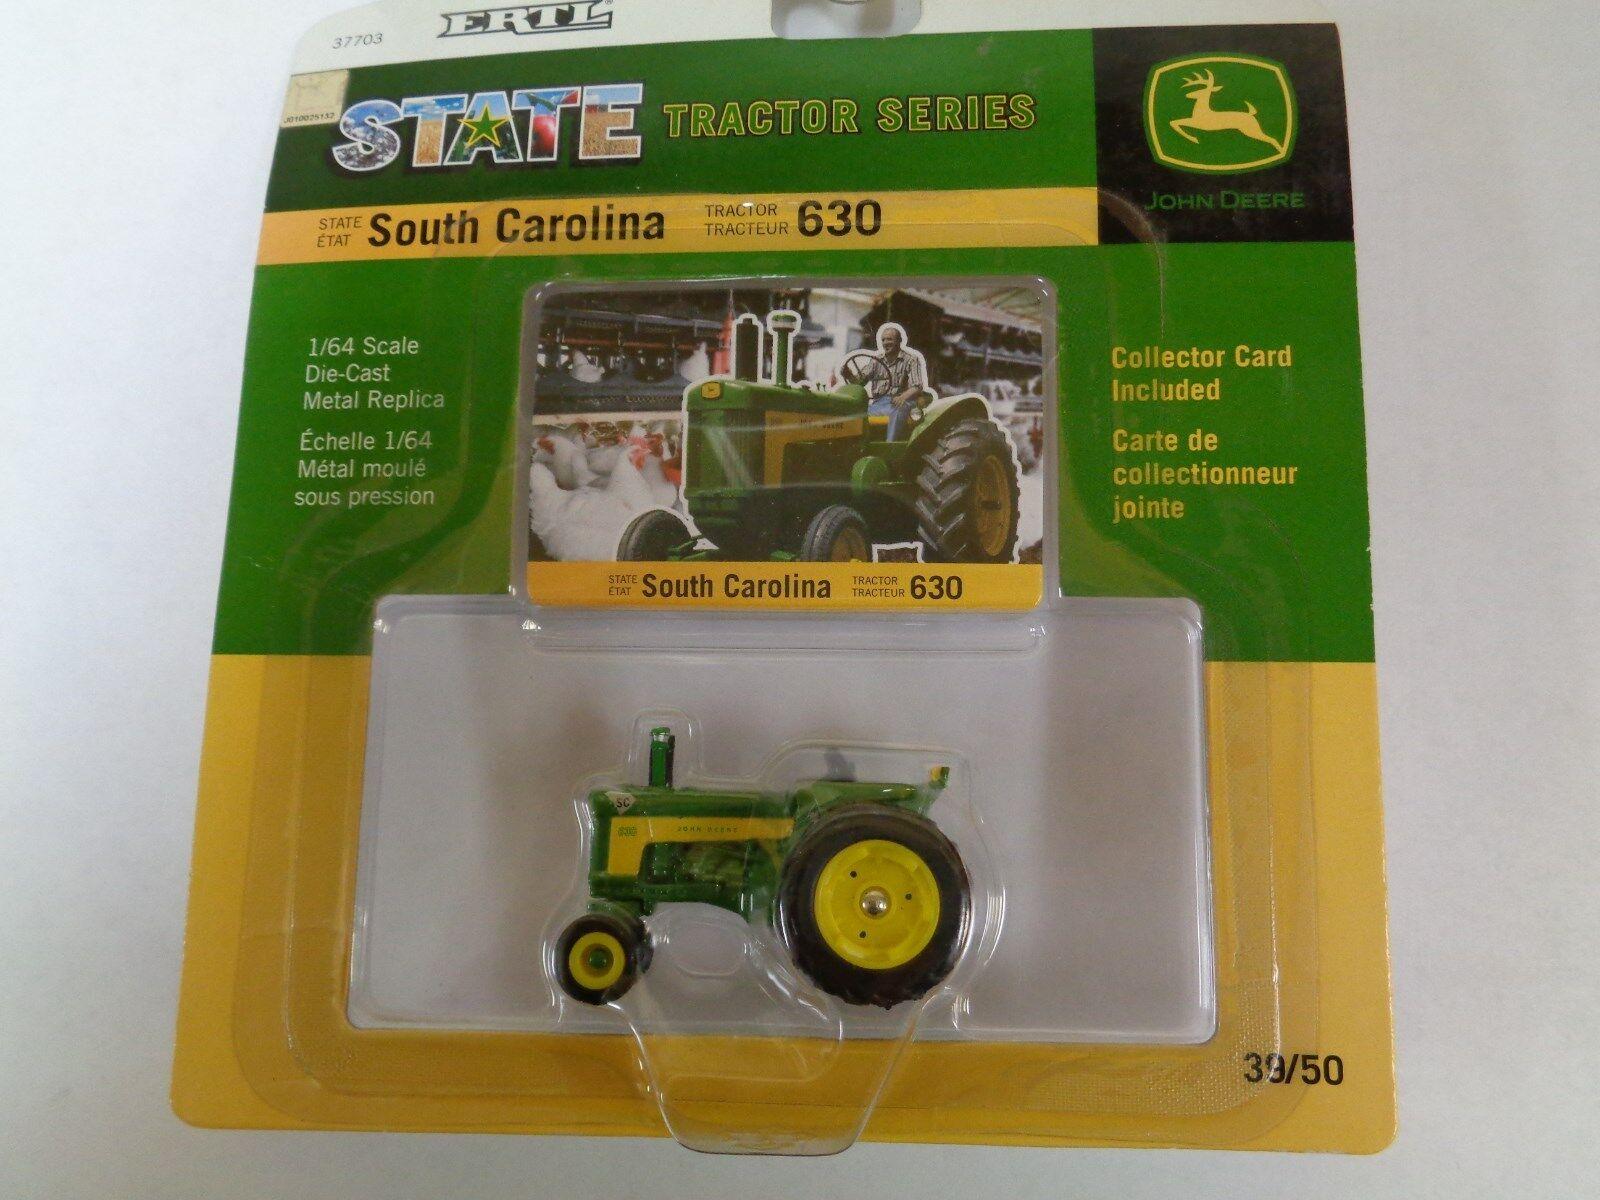 NEW John Deere 630 Tractor, Series, State Tractor Series, Tractor, South Carolina (37703SC) b1fbc6